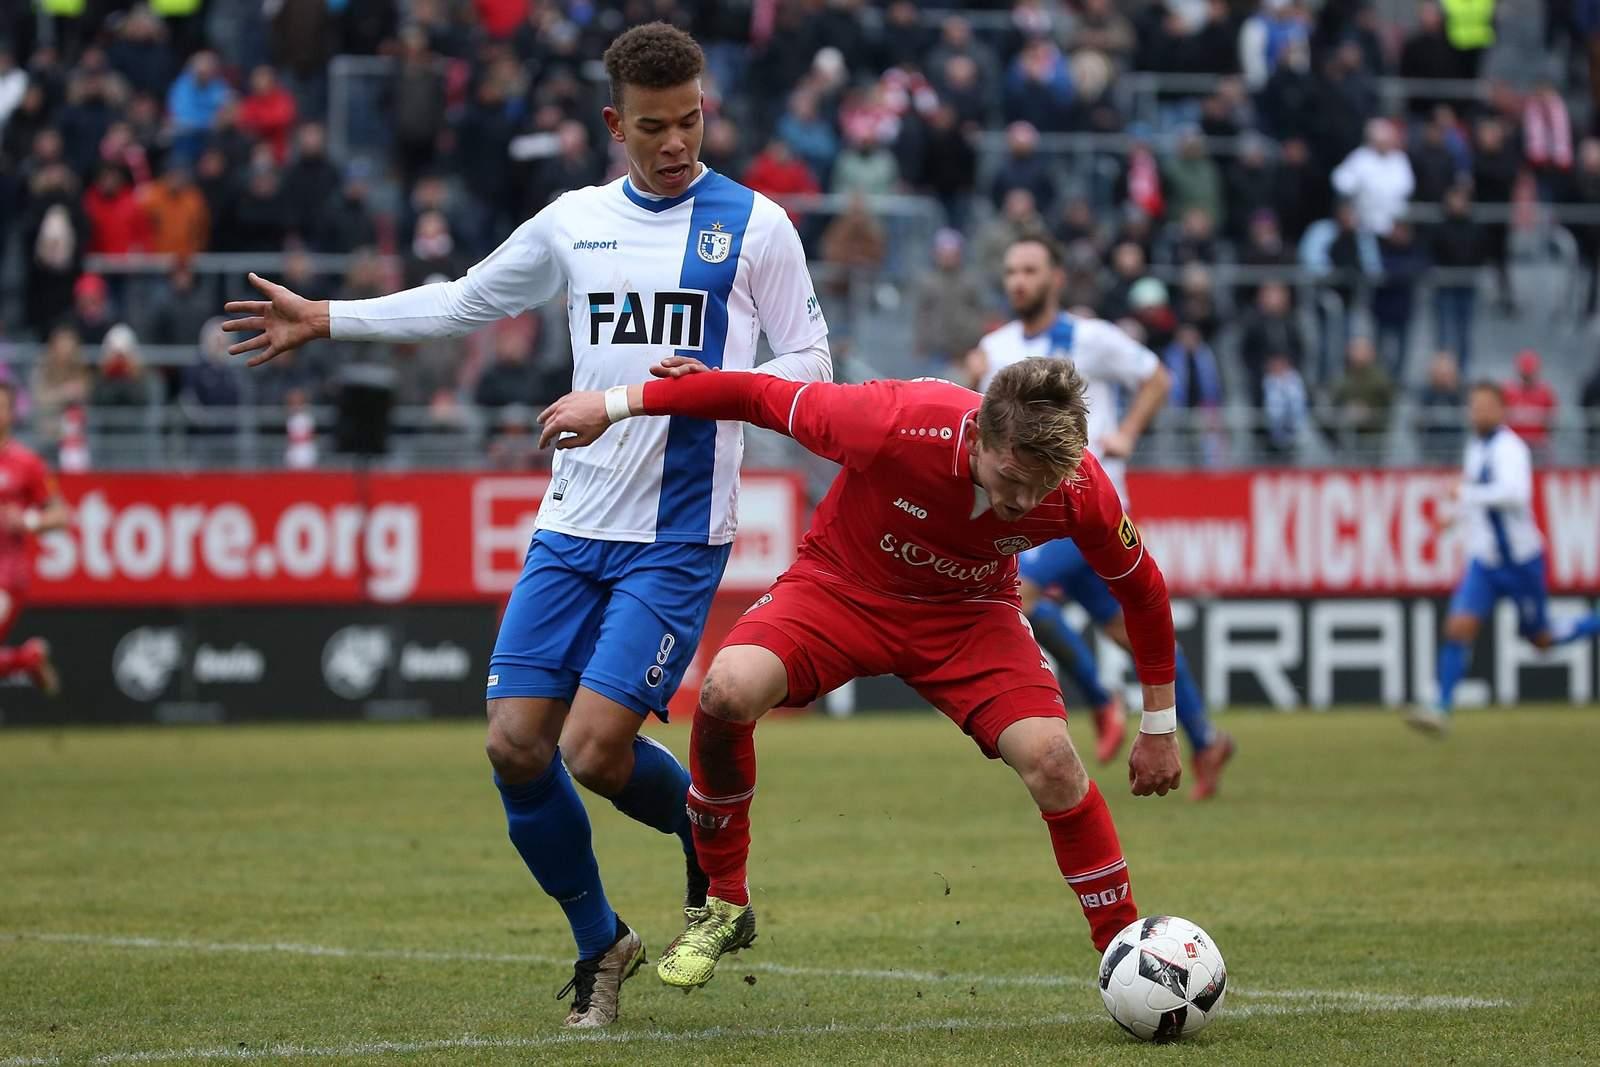 Marcel Costly vom 1. FC Magdeburg im Spiel gegen Würzburg